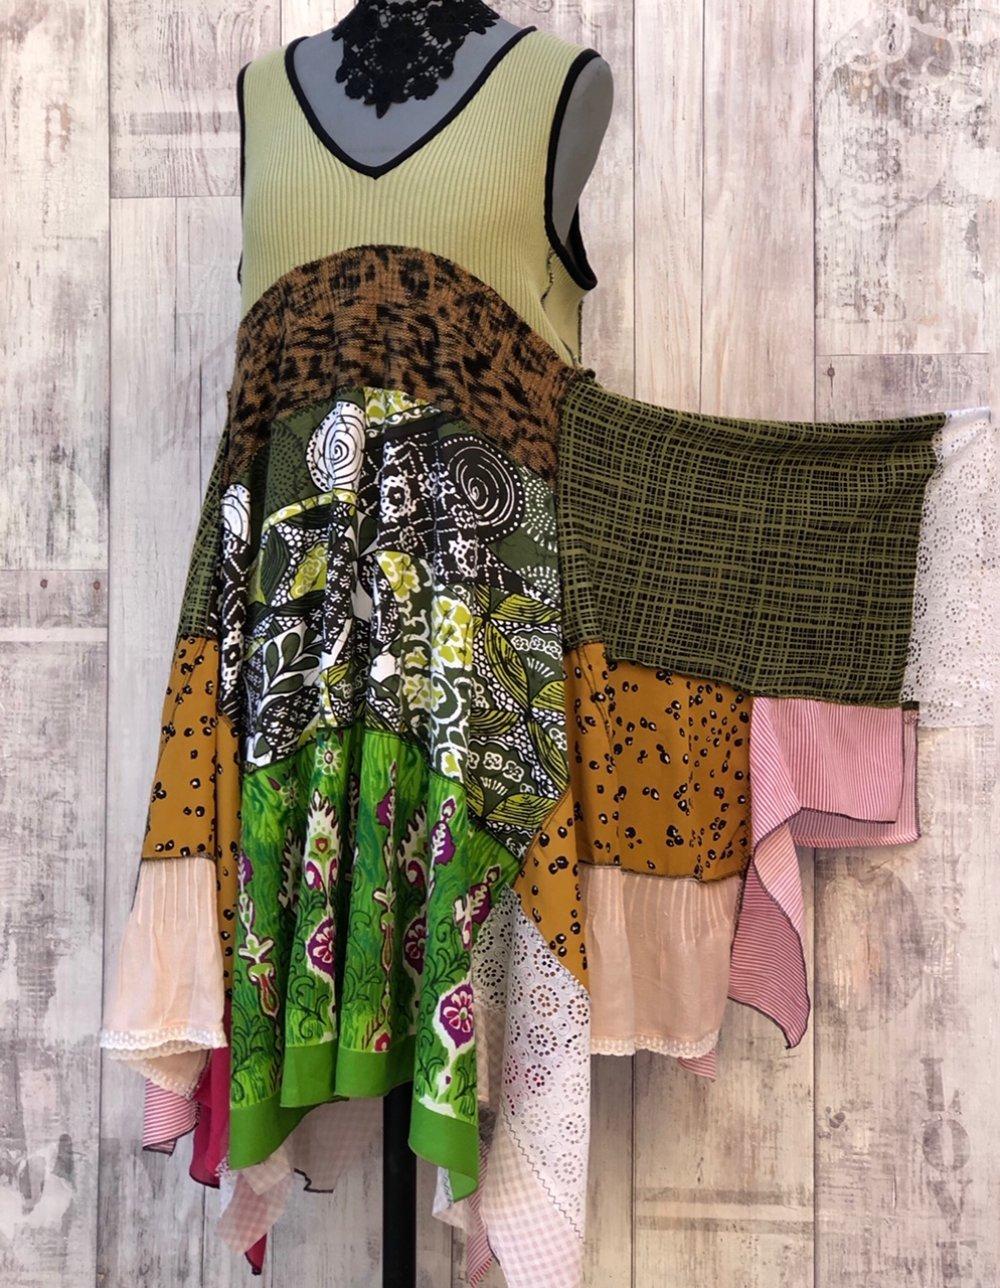 Upcycled Country Robe Jade verte,Patchwork,Boho,Hippie,Vintage Broderie & Dentelles, hippie boho chic , Rostic Art, Vêtement Recyclés S/M